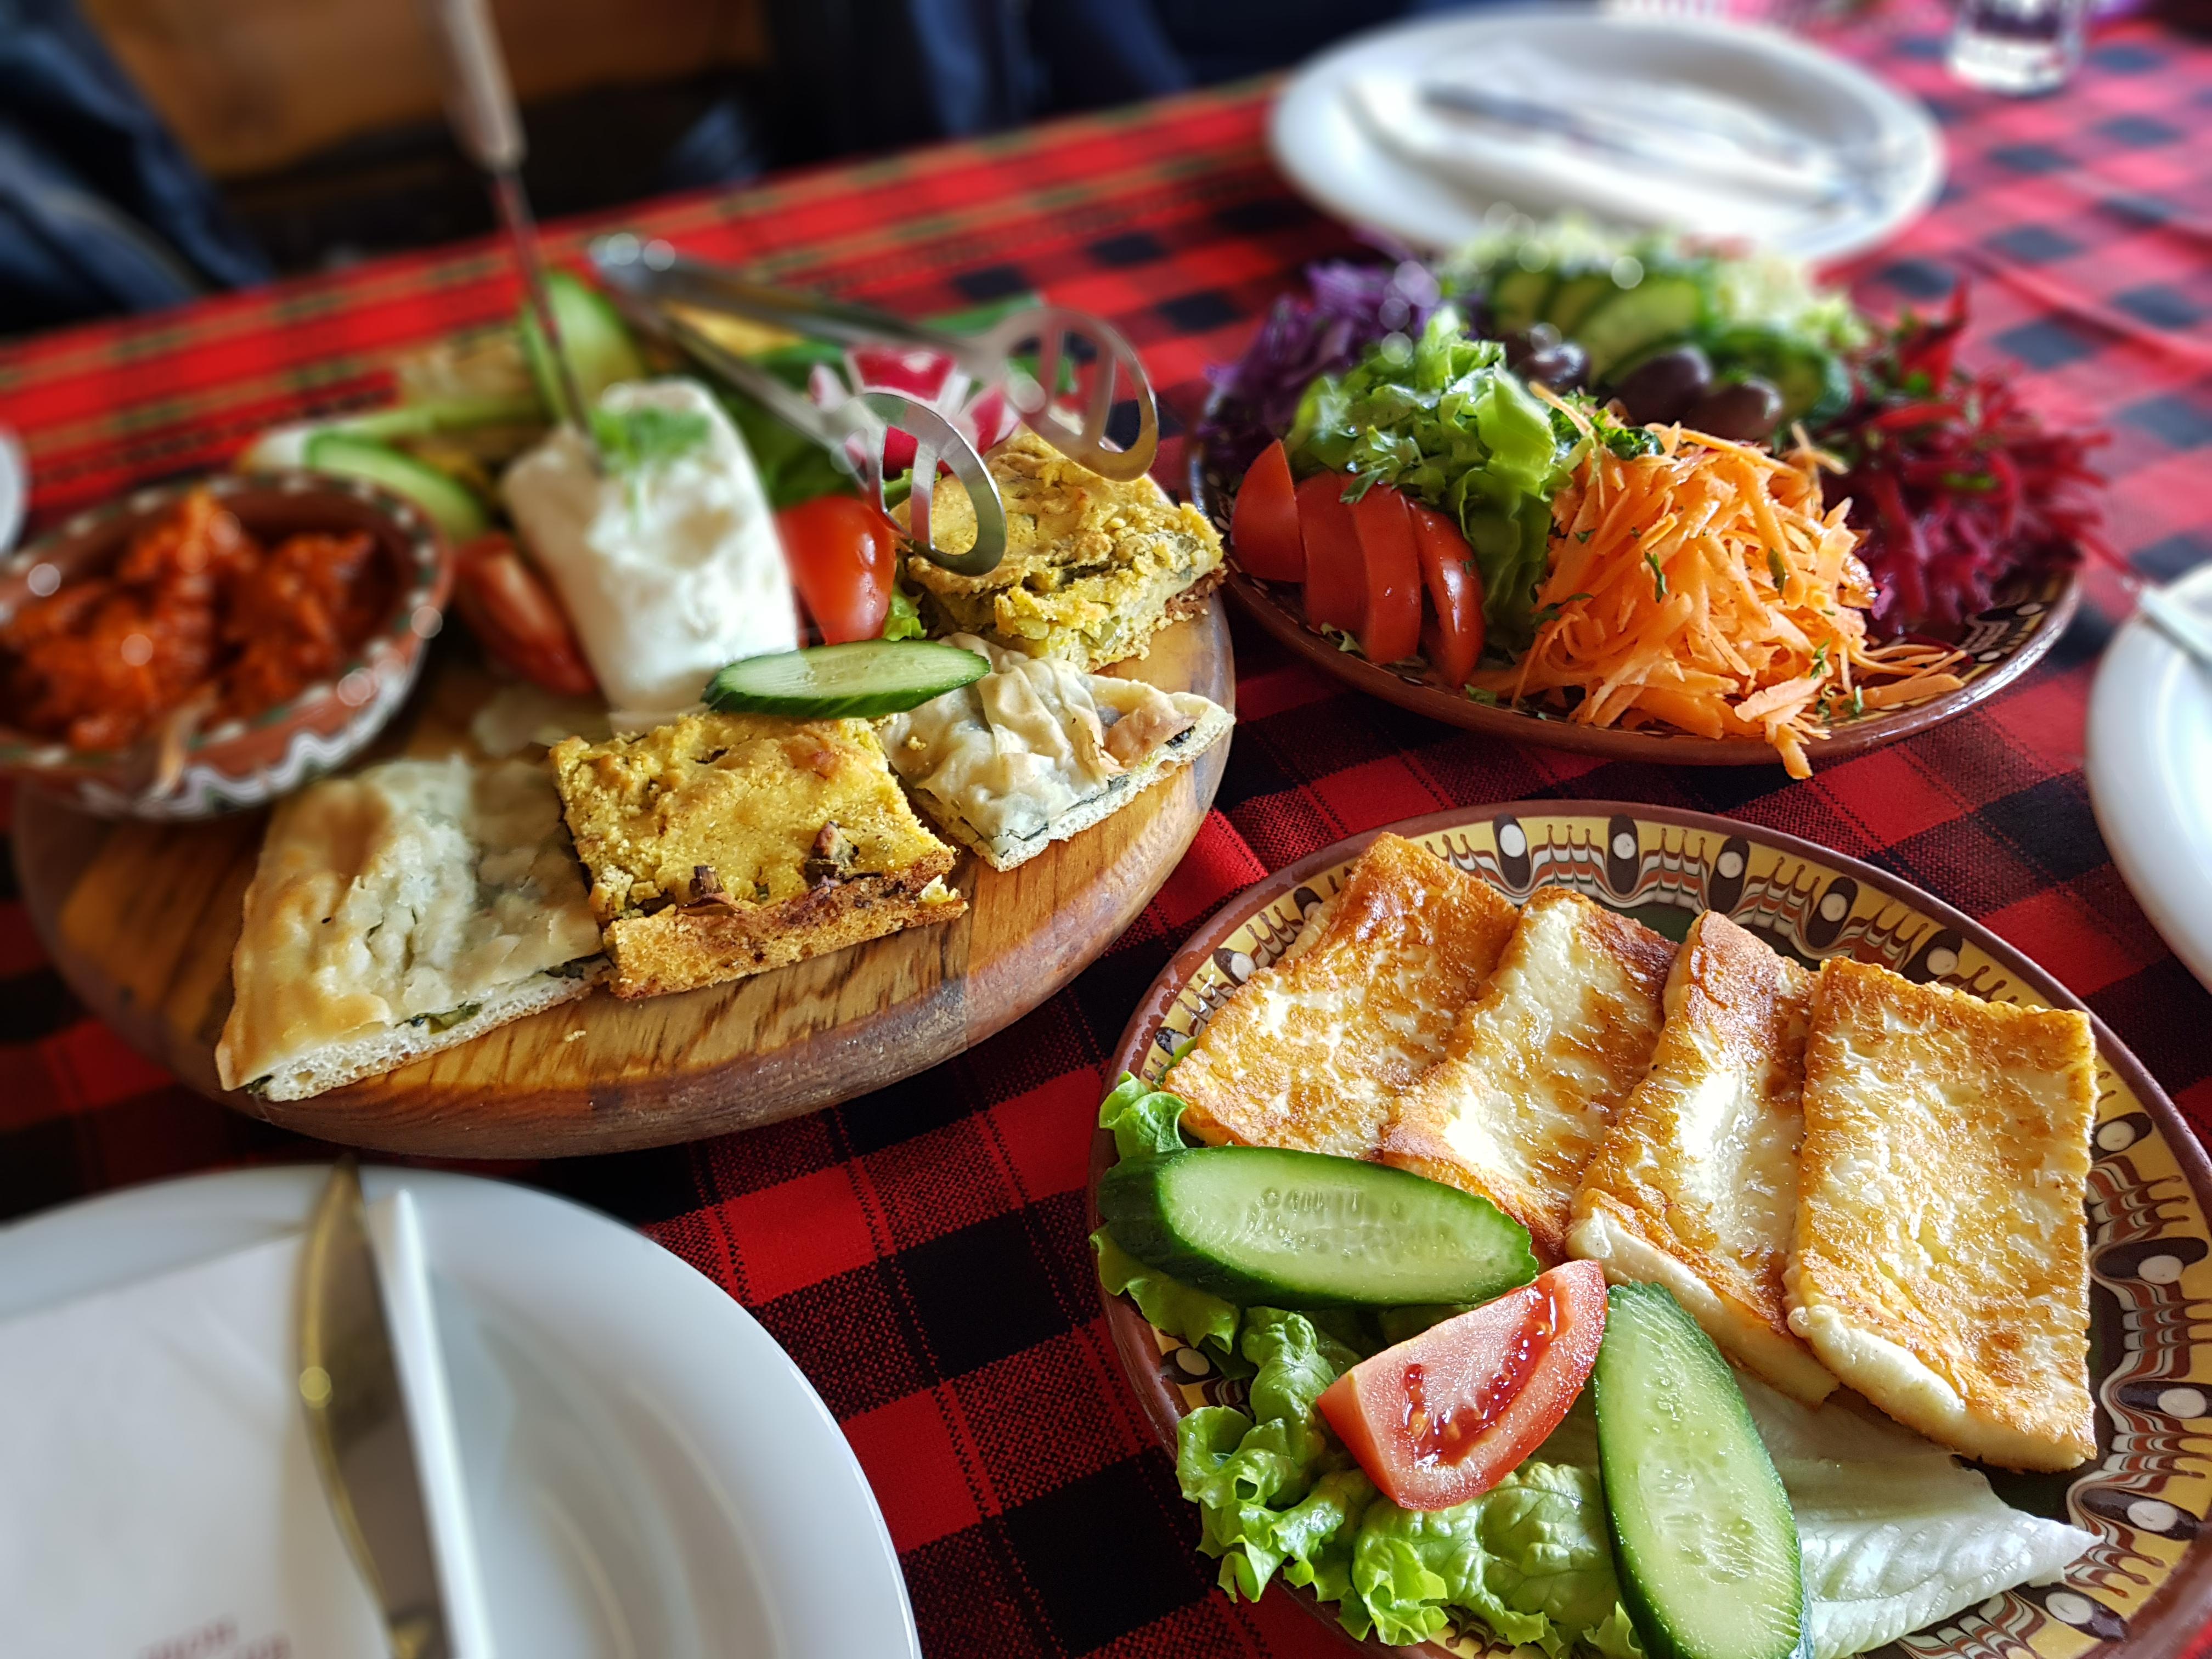 delicious_macedonian_food_kutmicevica